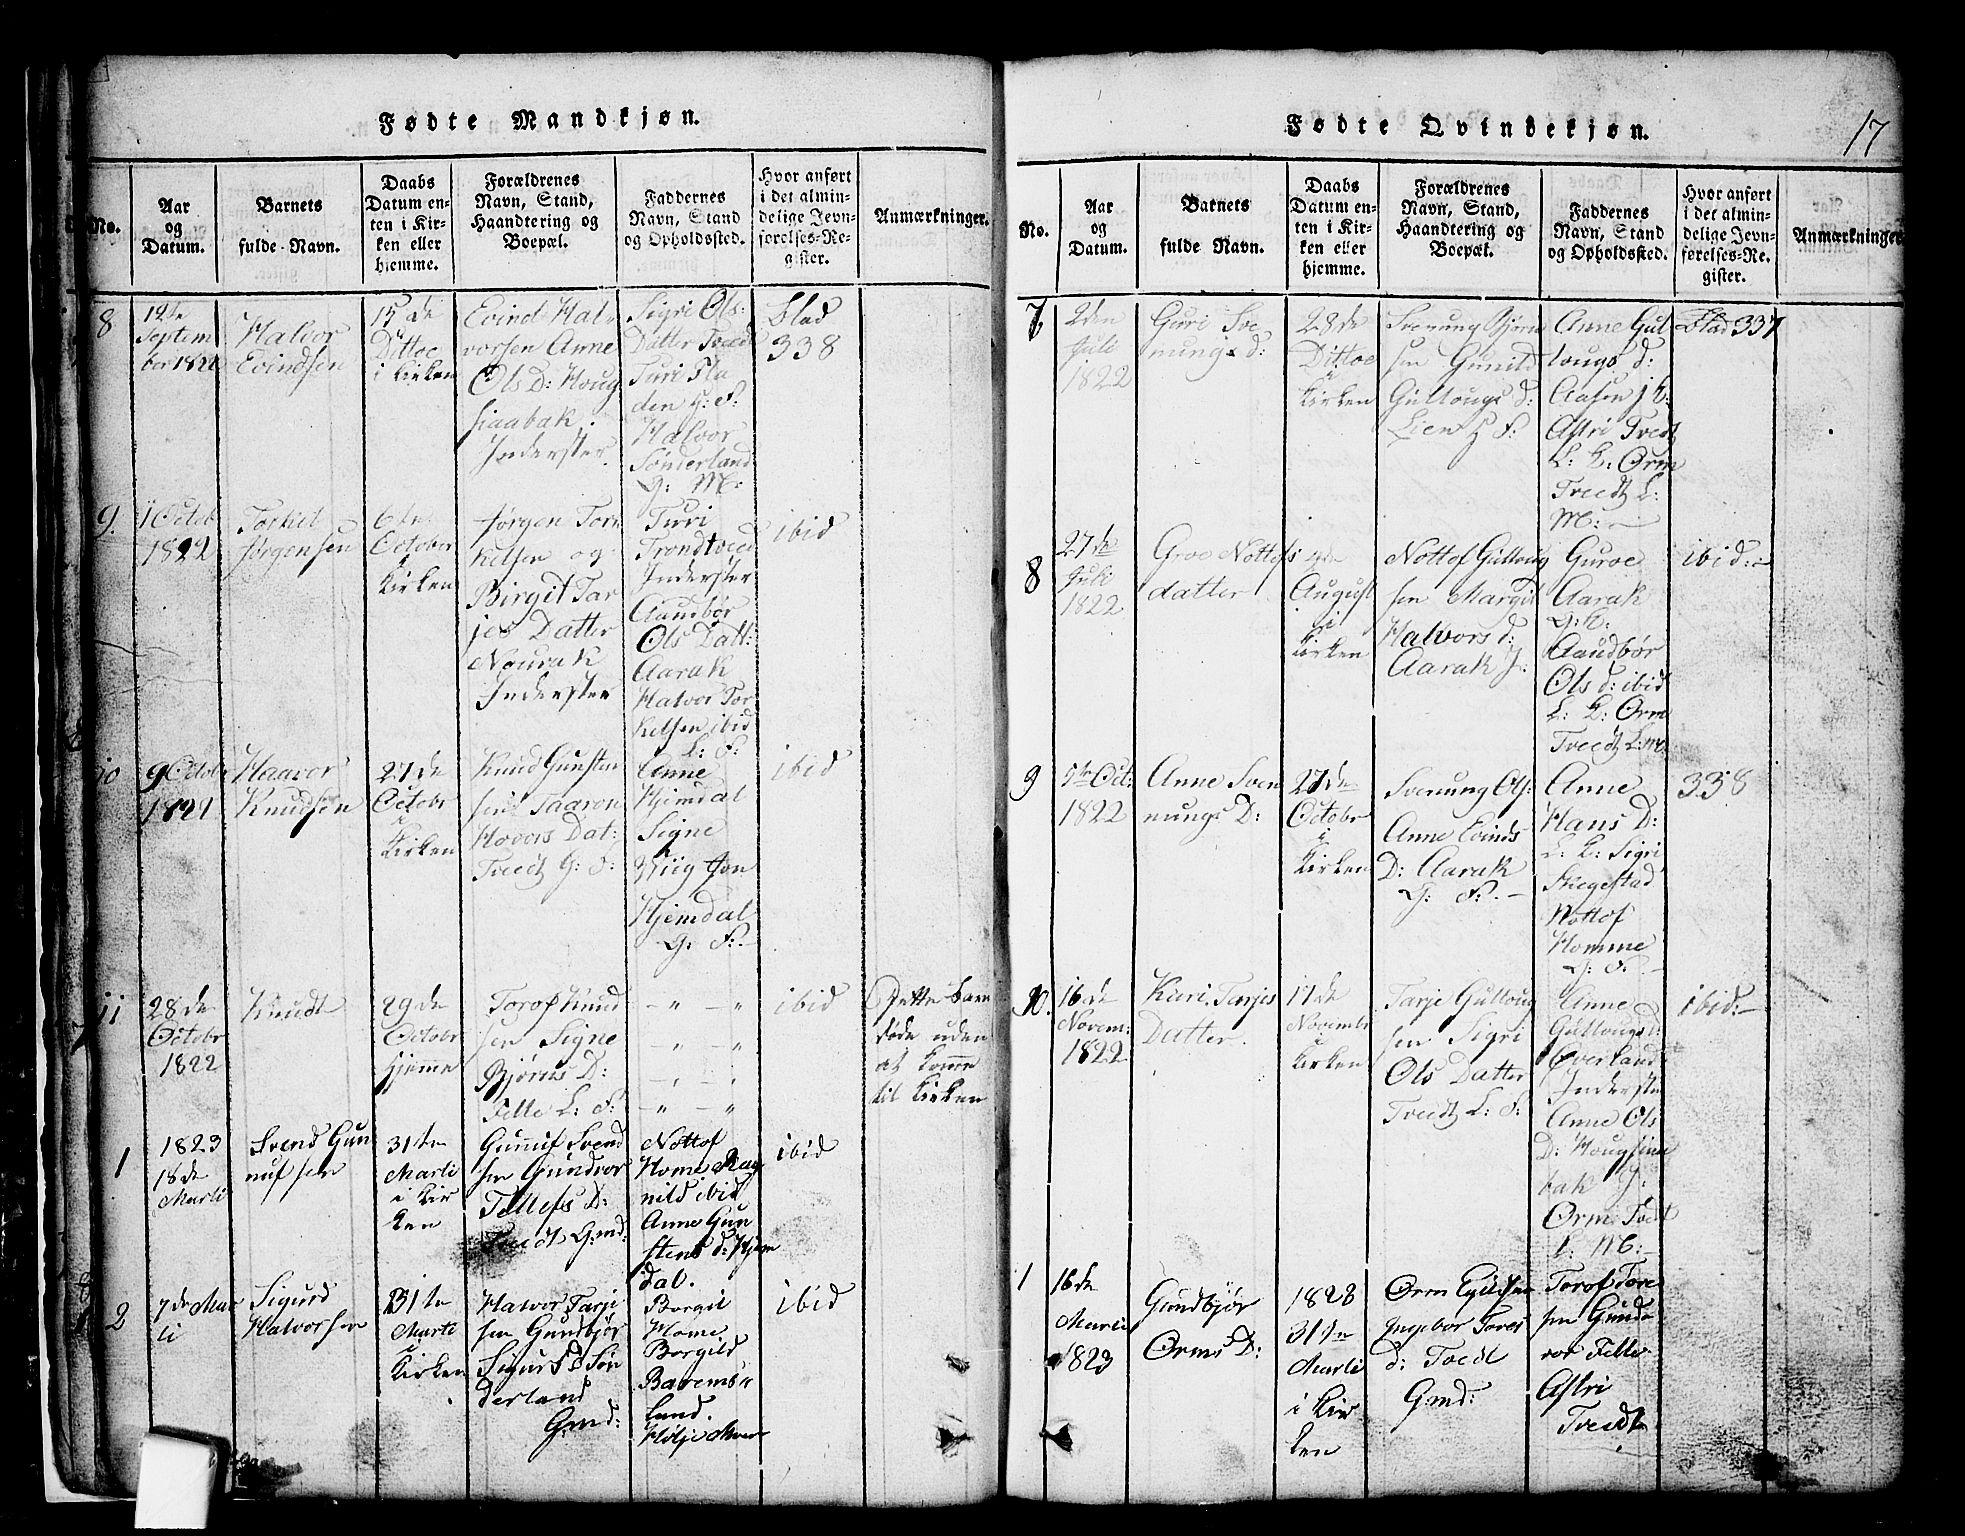 SAKO, Nissedal kirkebøker, G/Gb/L0001: Klokkerbok nr. II 1, 1814-1862, s. 17